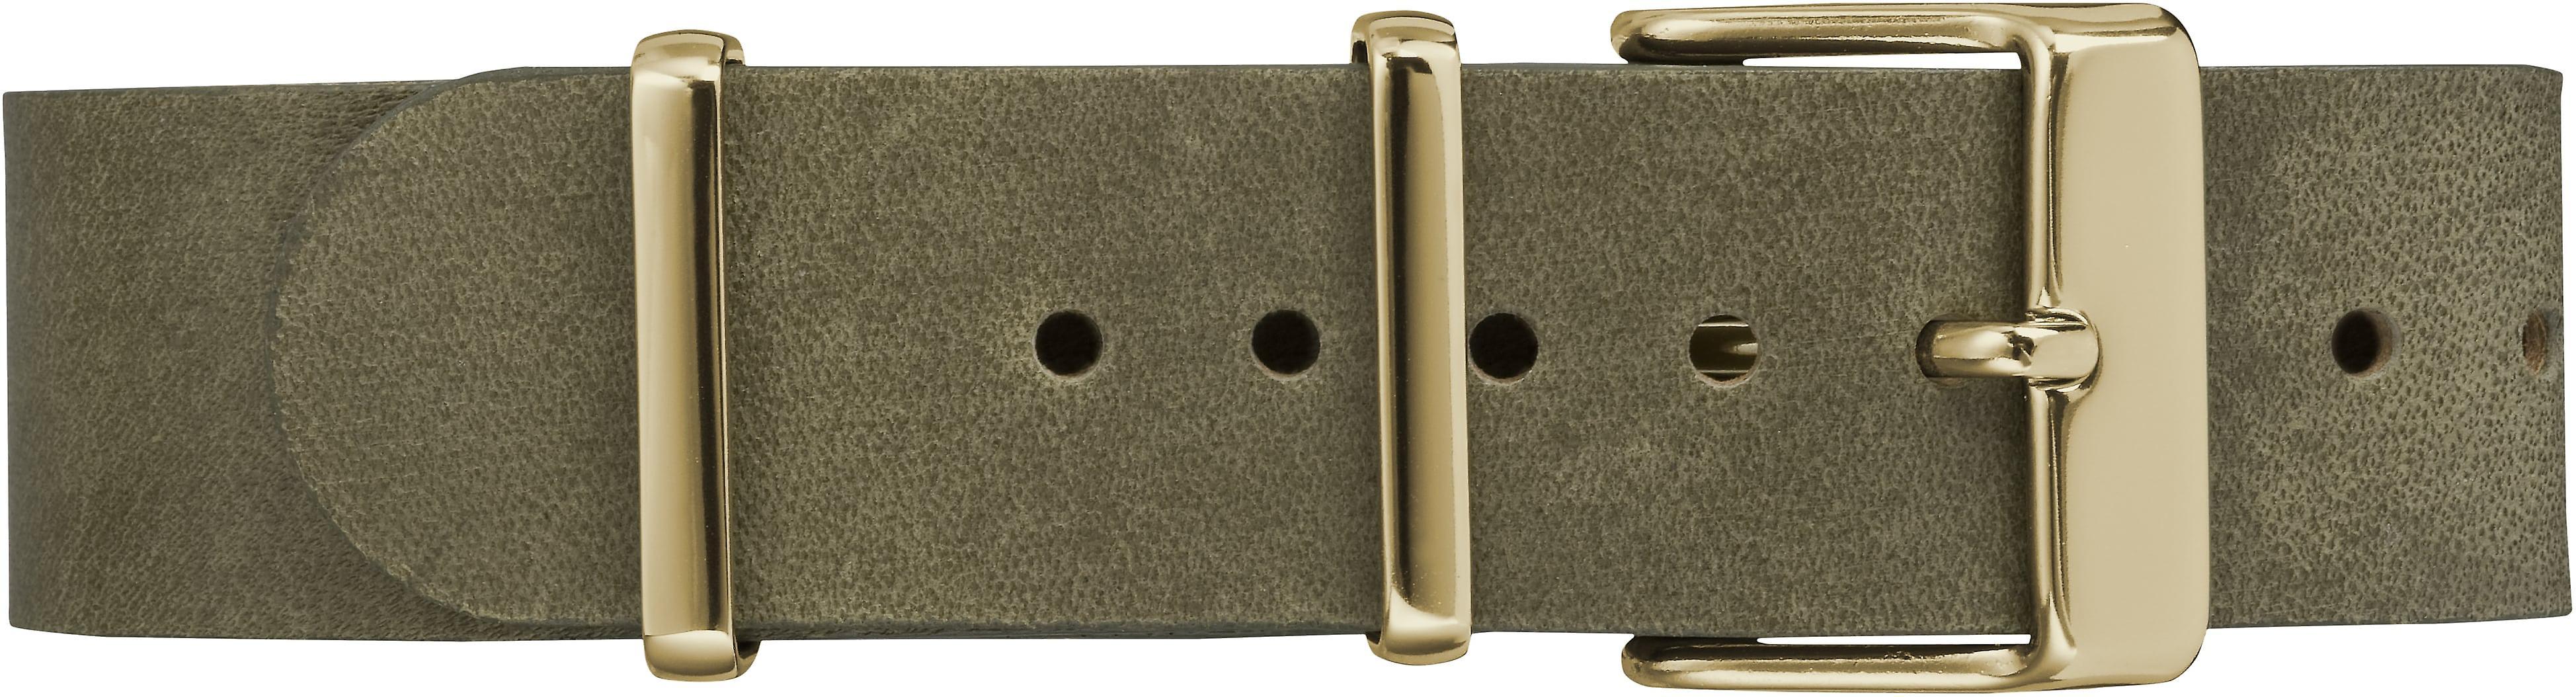 Timex Weekender Brown Leather Strap Unisex Watch TW2P98500 37mm